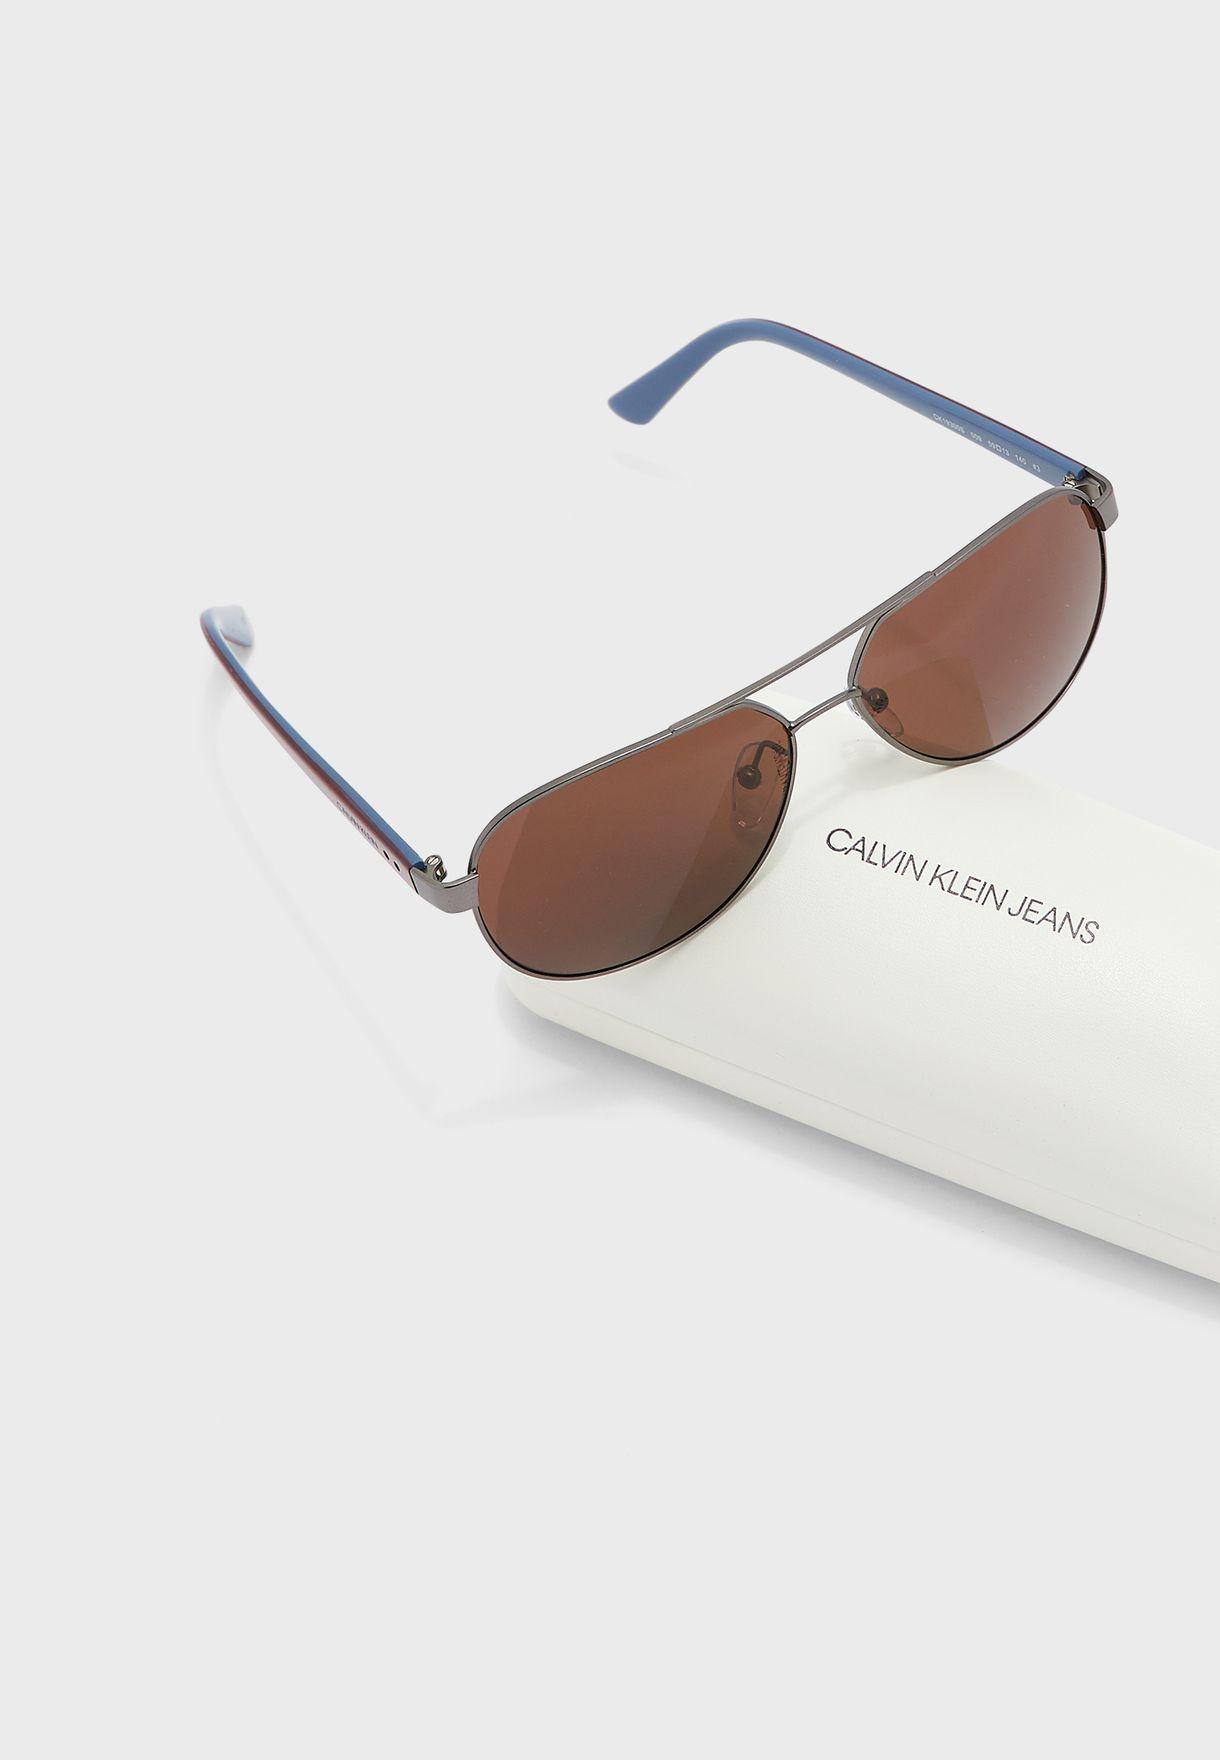 Ck19300S Aviator Sunglasses